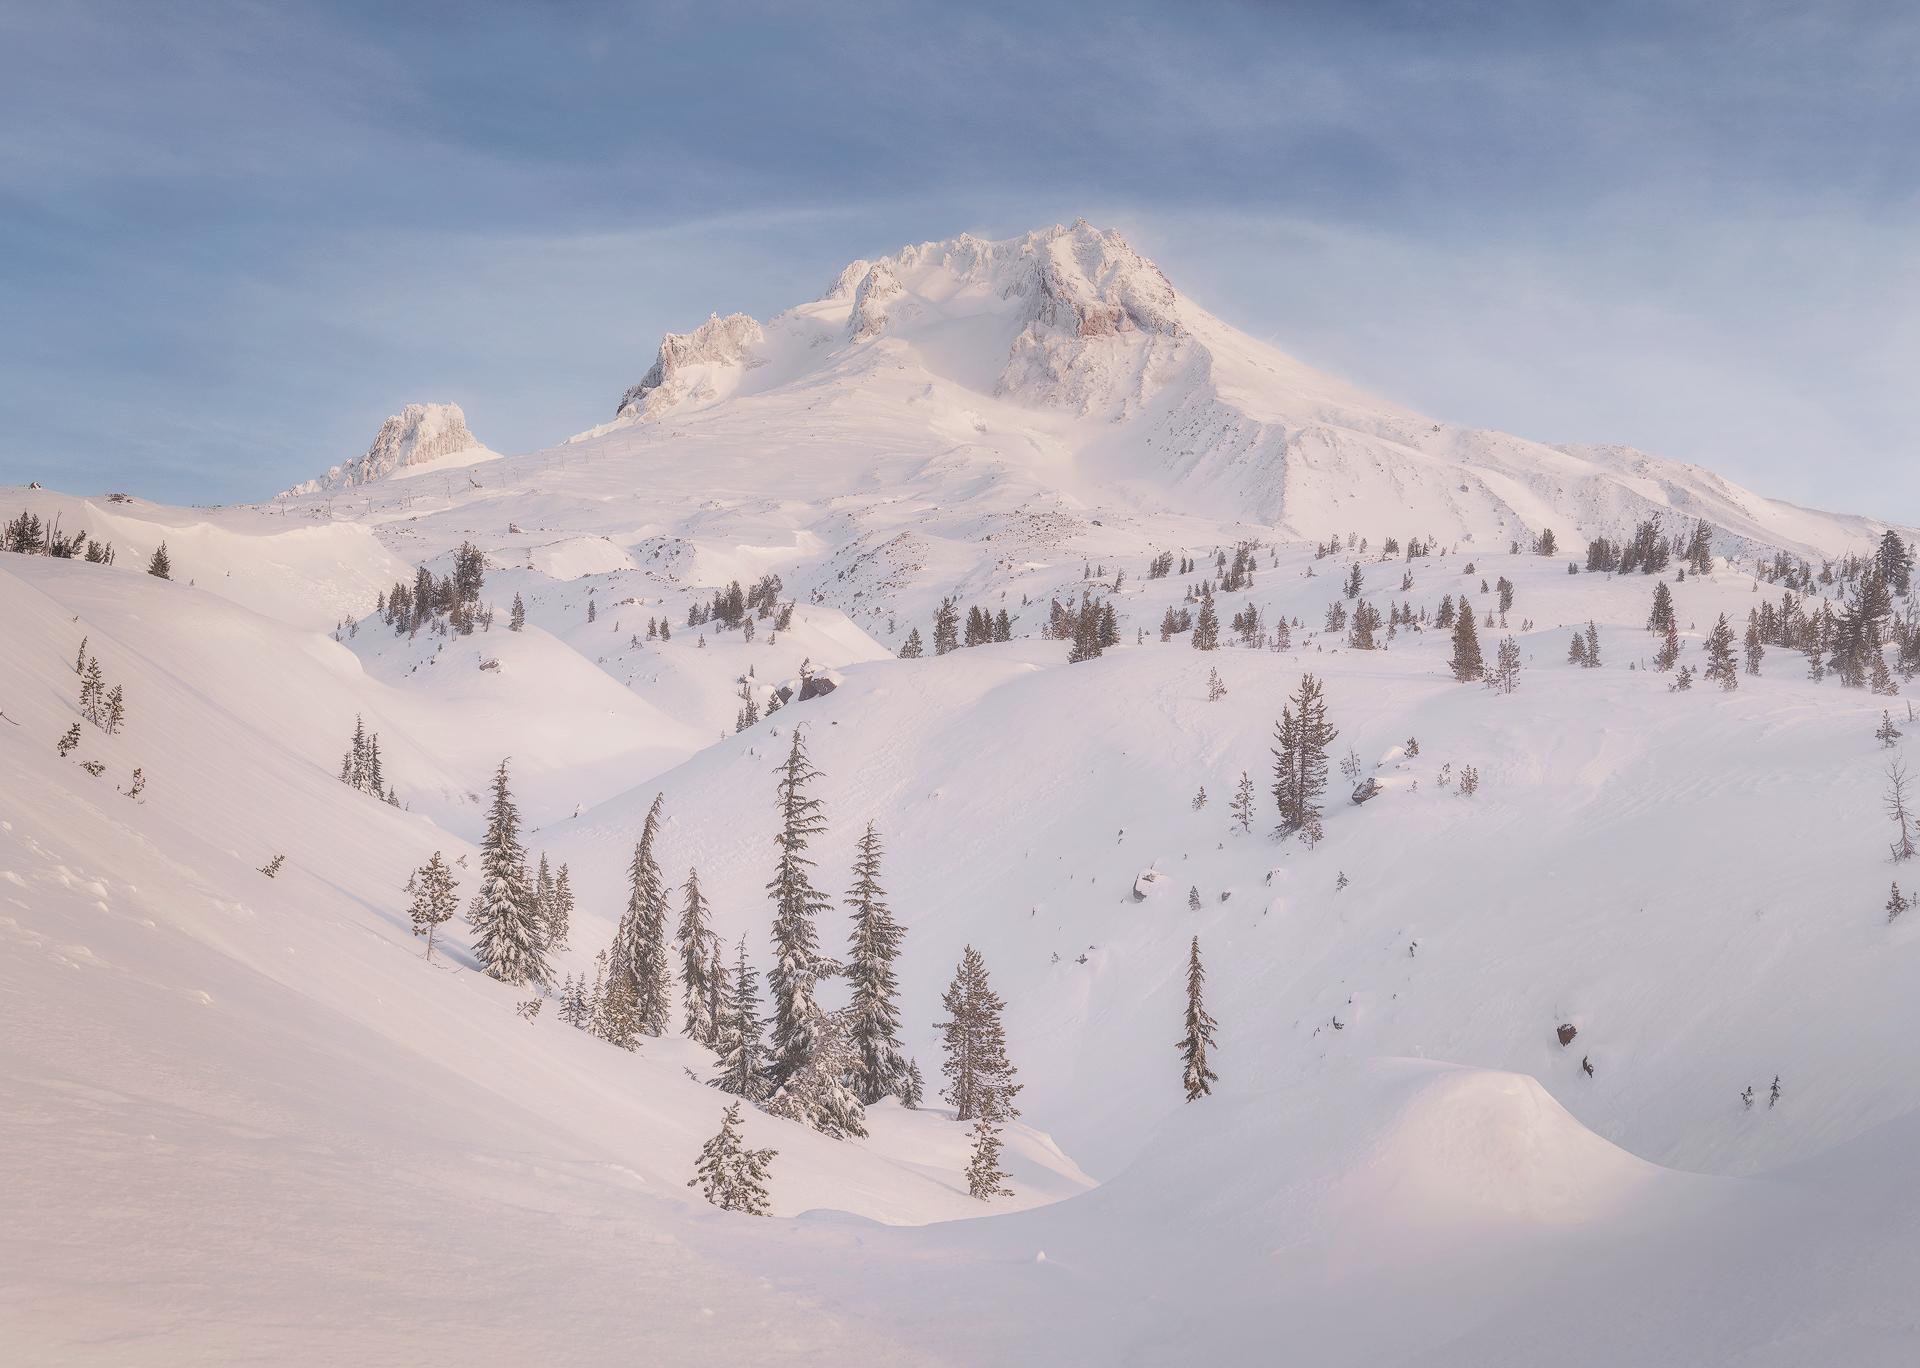 Mount_Hood_TER1785x.jpg